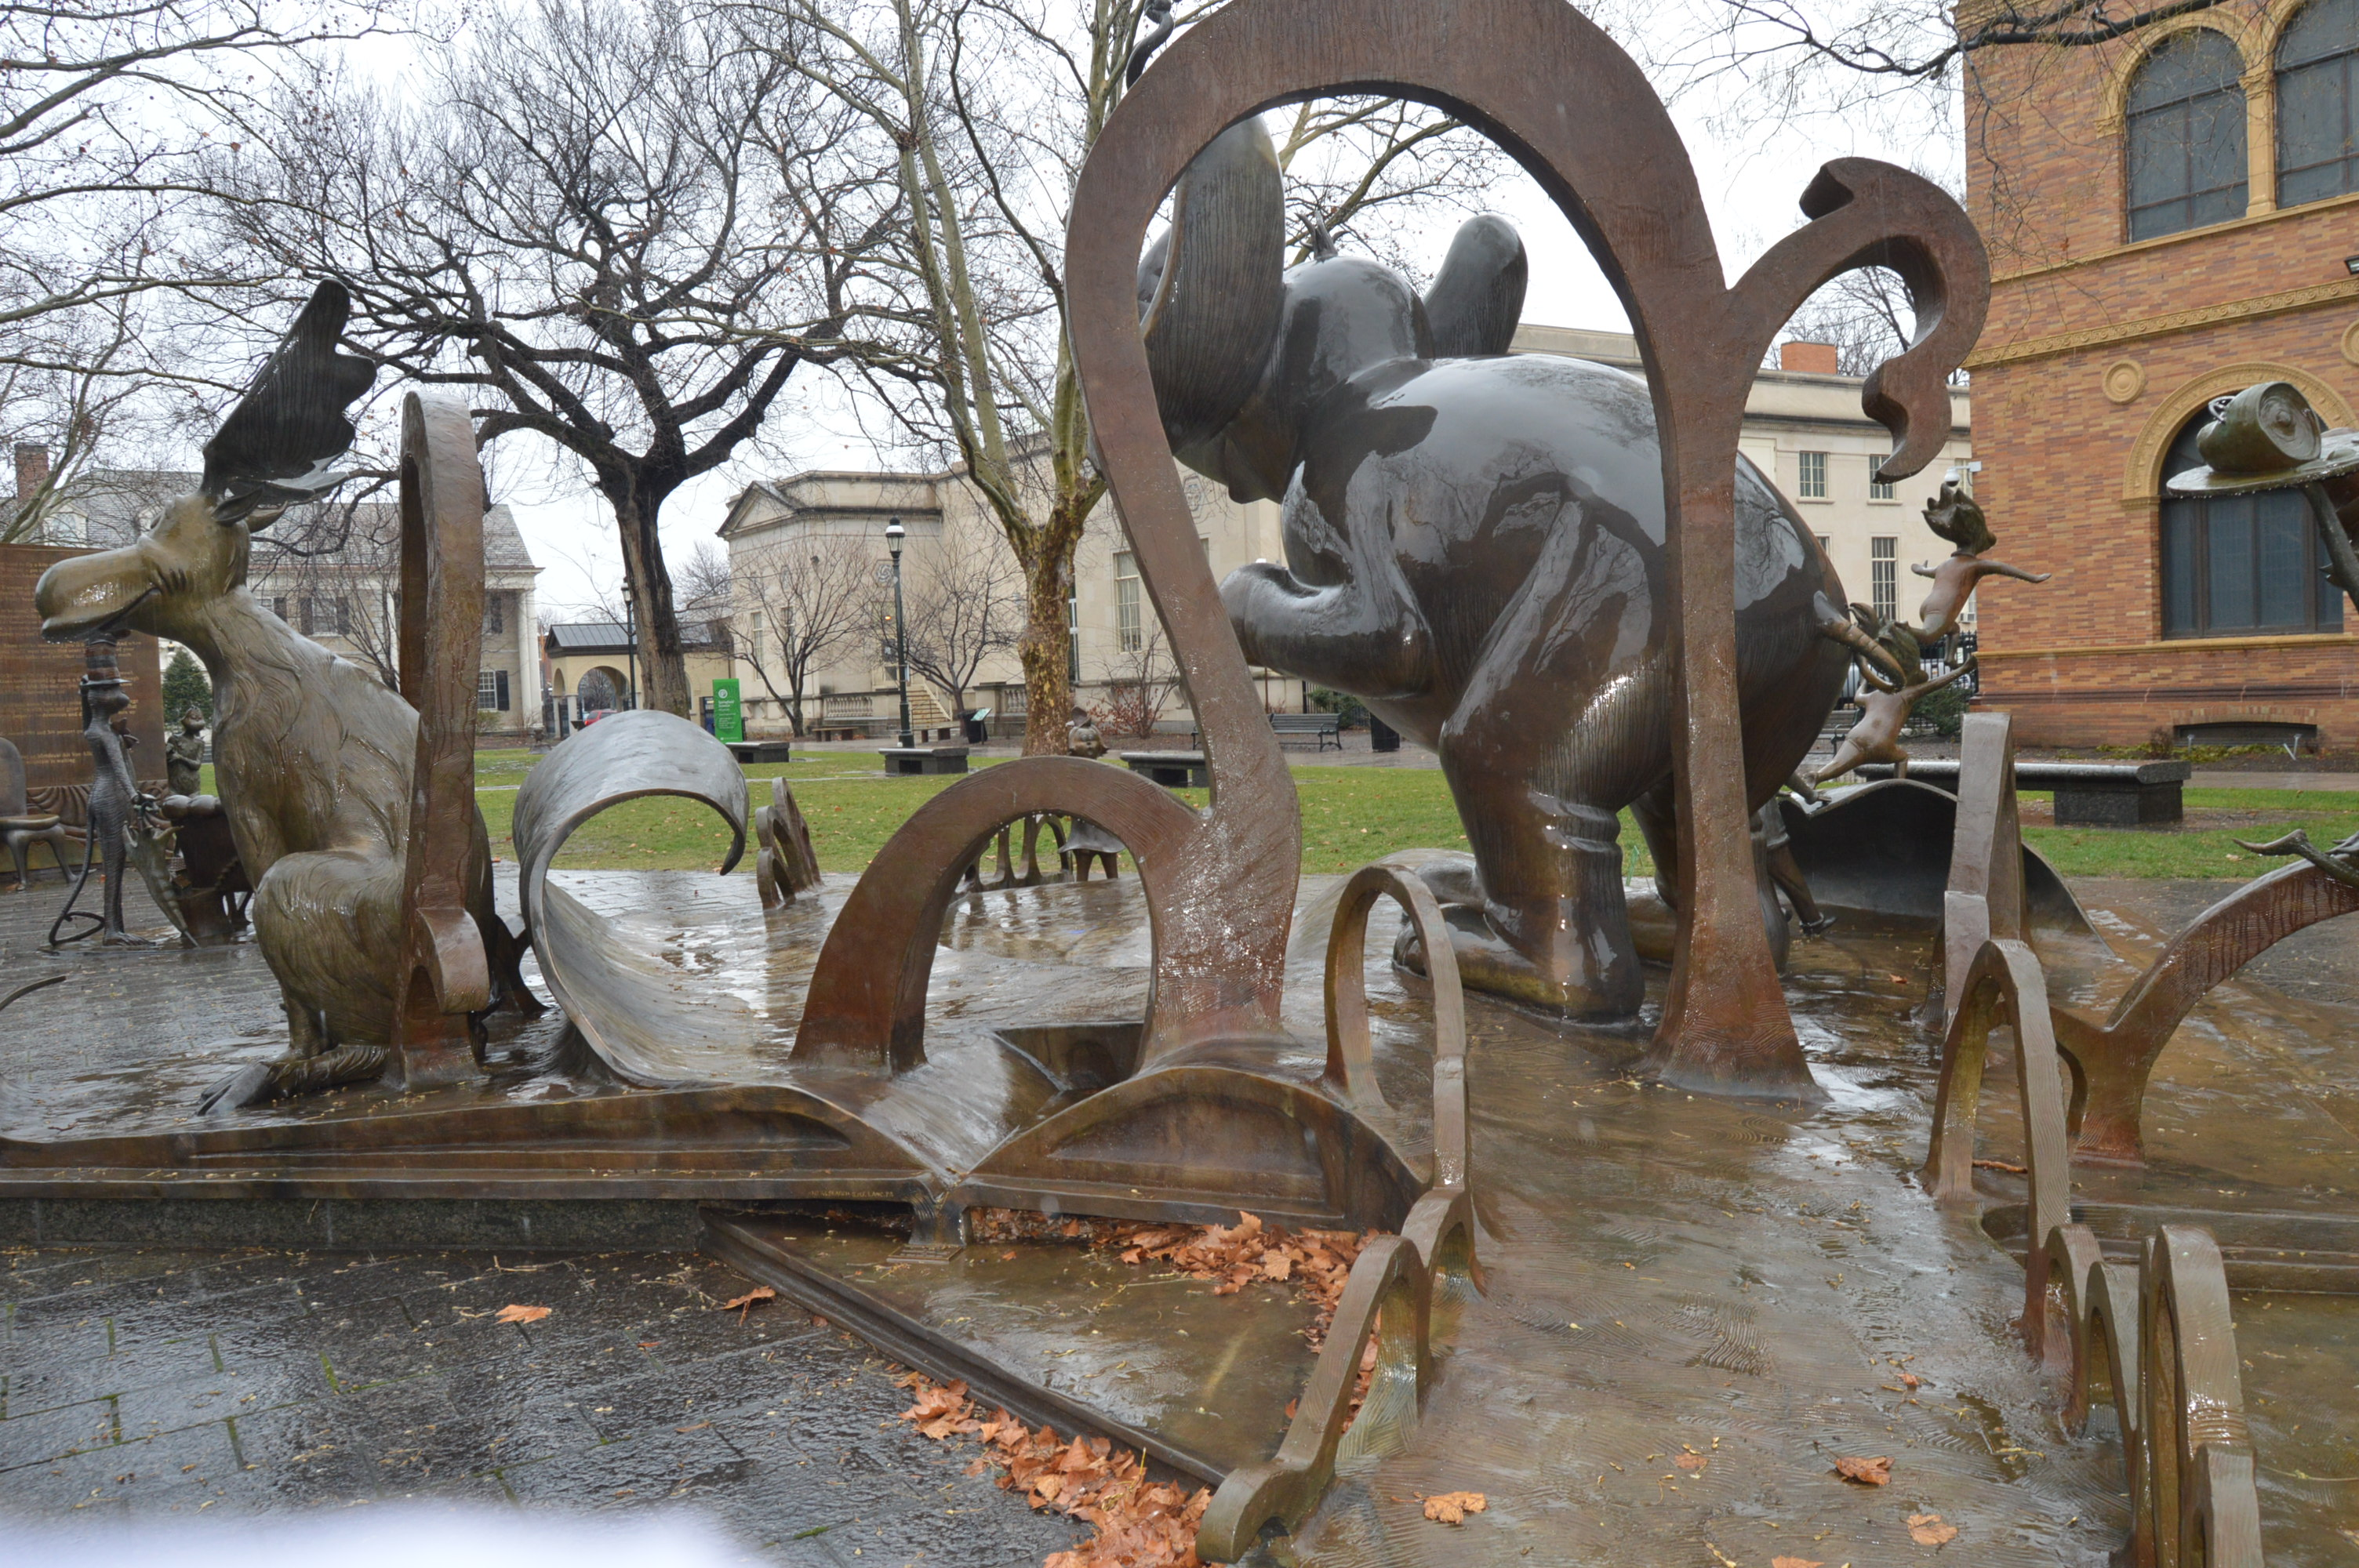 Dr Seuss National Memorial Sculpture Garden Springfield Ma New England Nomad